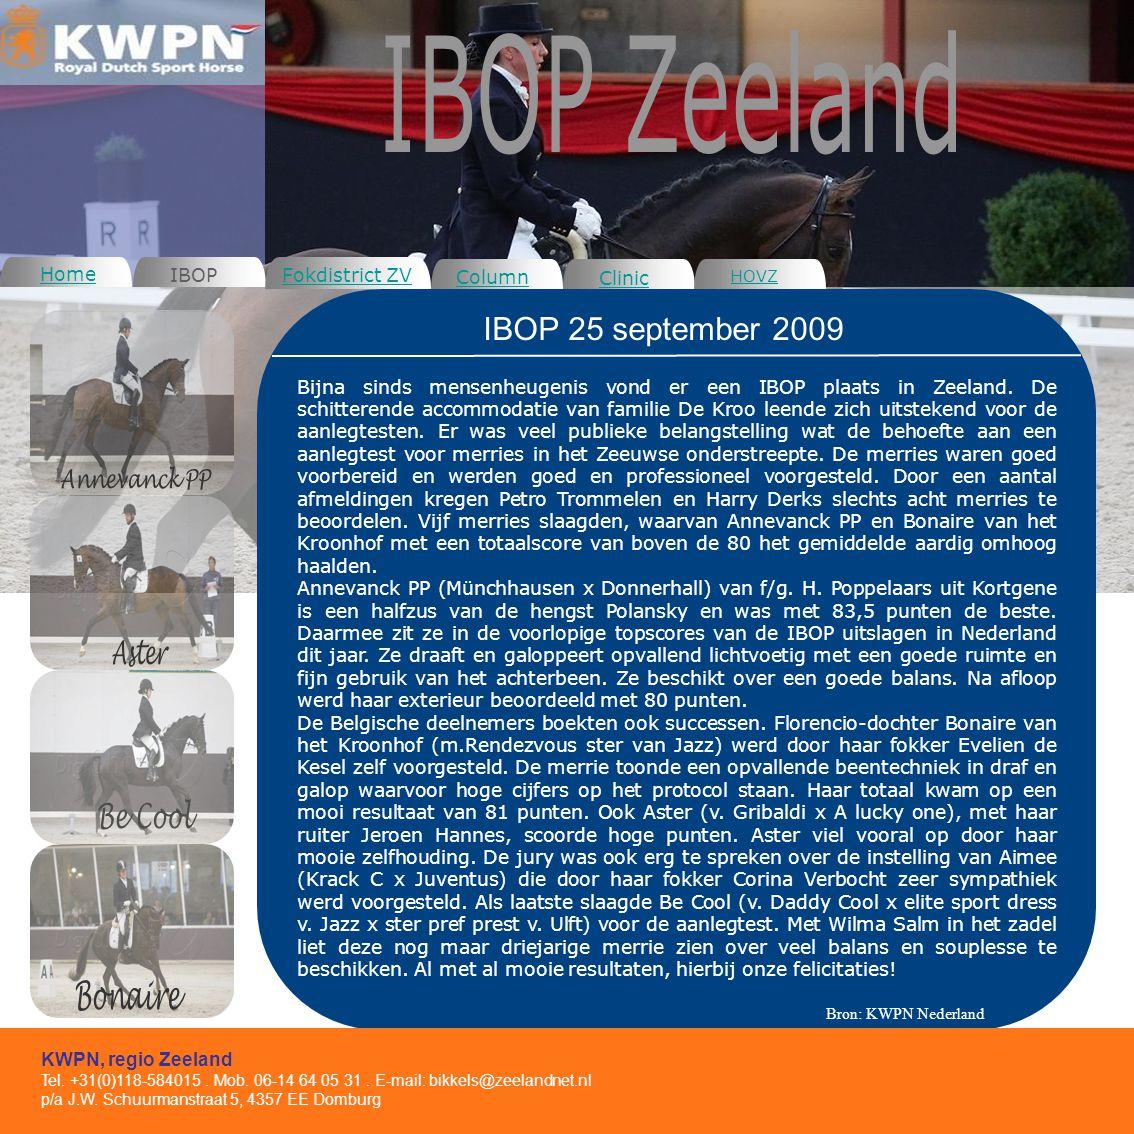 nr. Home IBOP KWPN, regio Zeeland Tel. +31(0)118-584015.